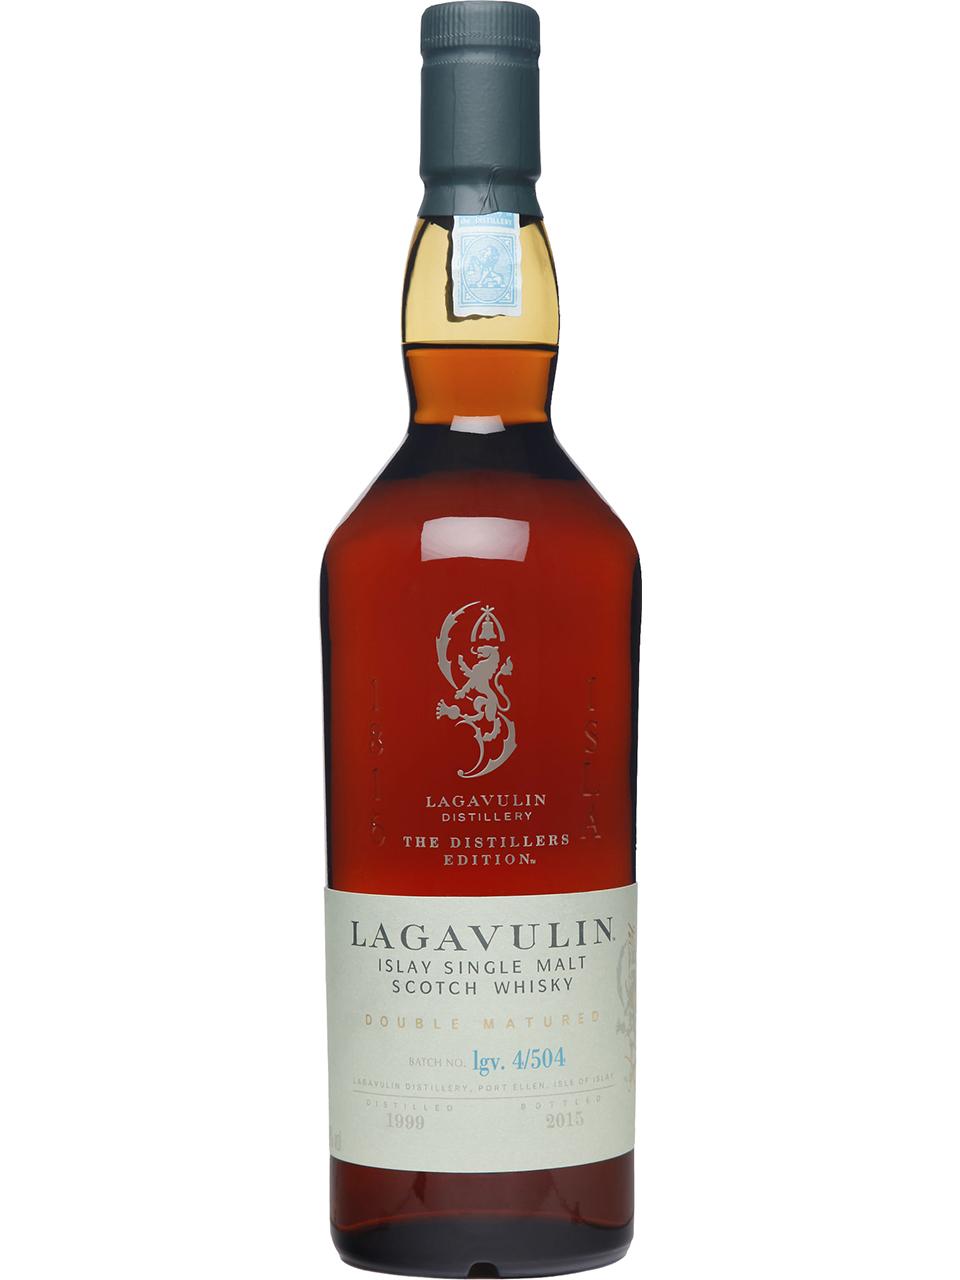 Lagavulin Distillers Edition Single Malt Scotch